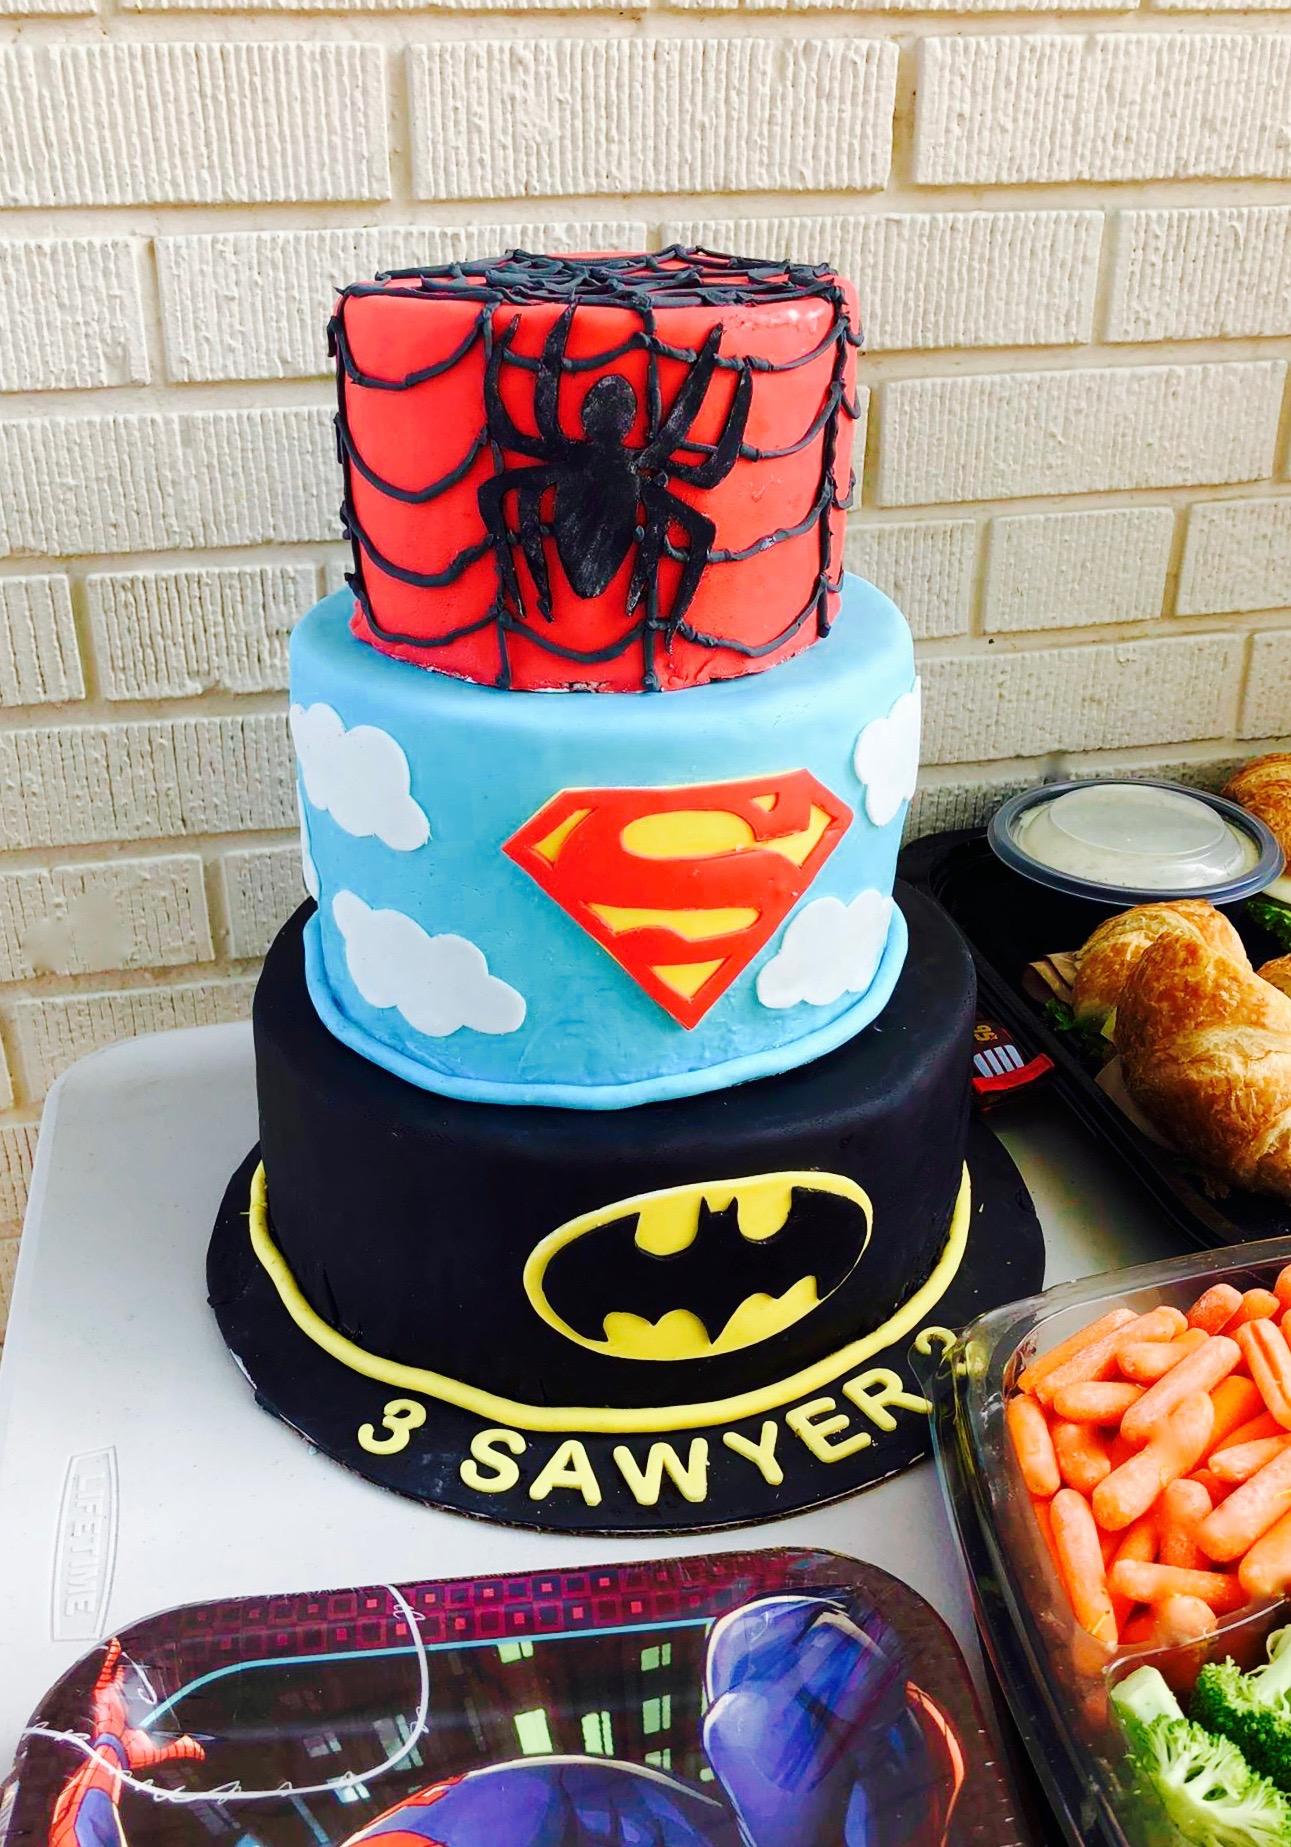 Super superhero cake!!